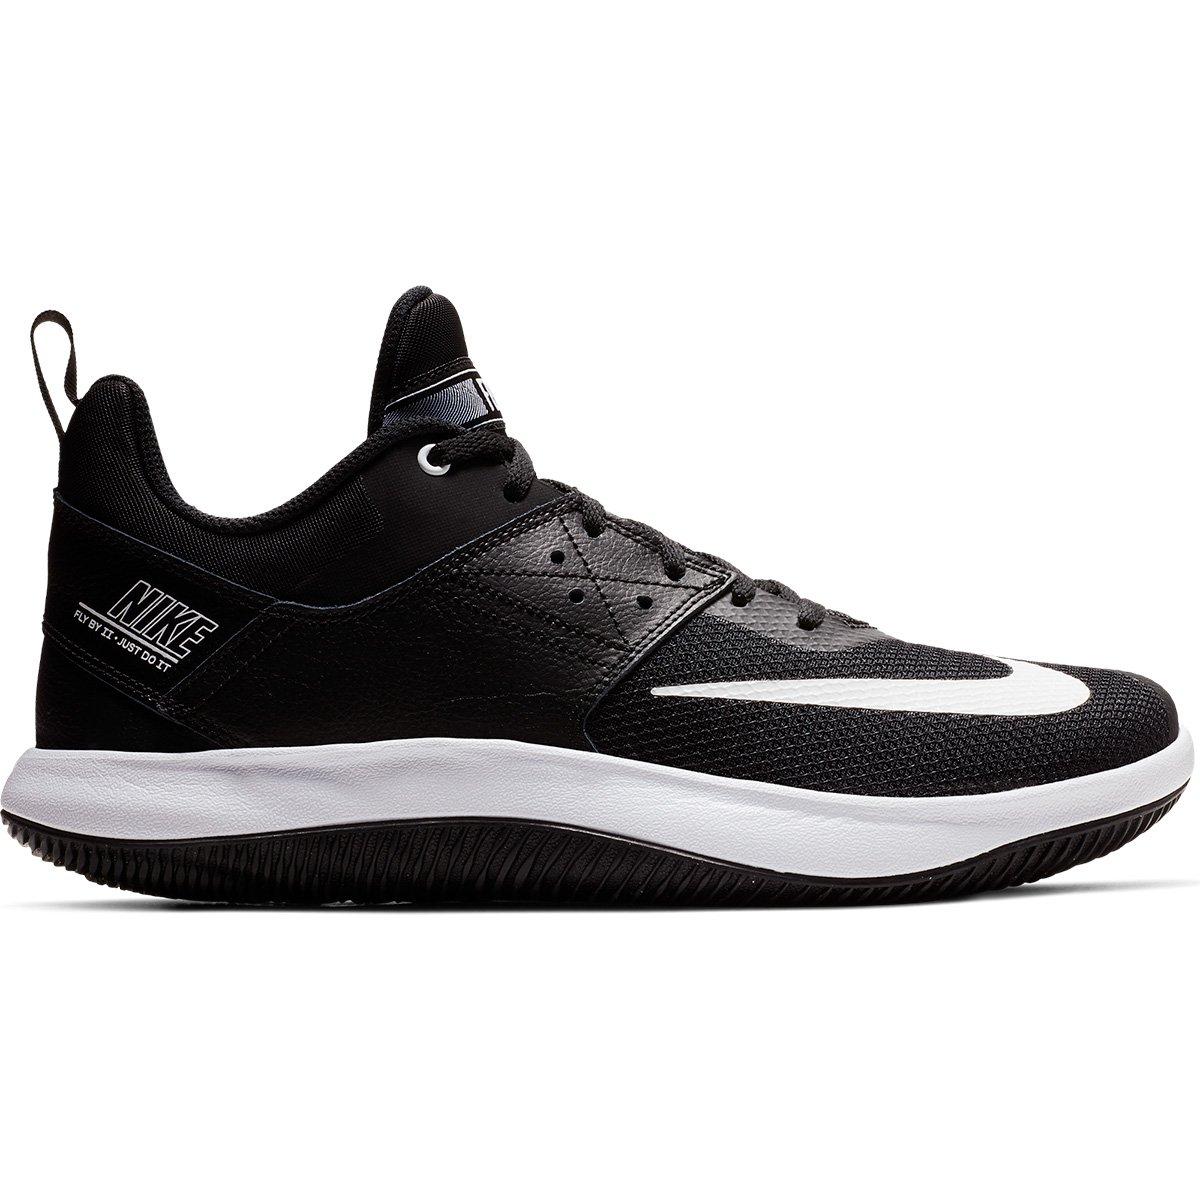 Tênis Nike Fly By Low Masculino - Preto e Branco - Compre Agora ... b9ba141903e9d